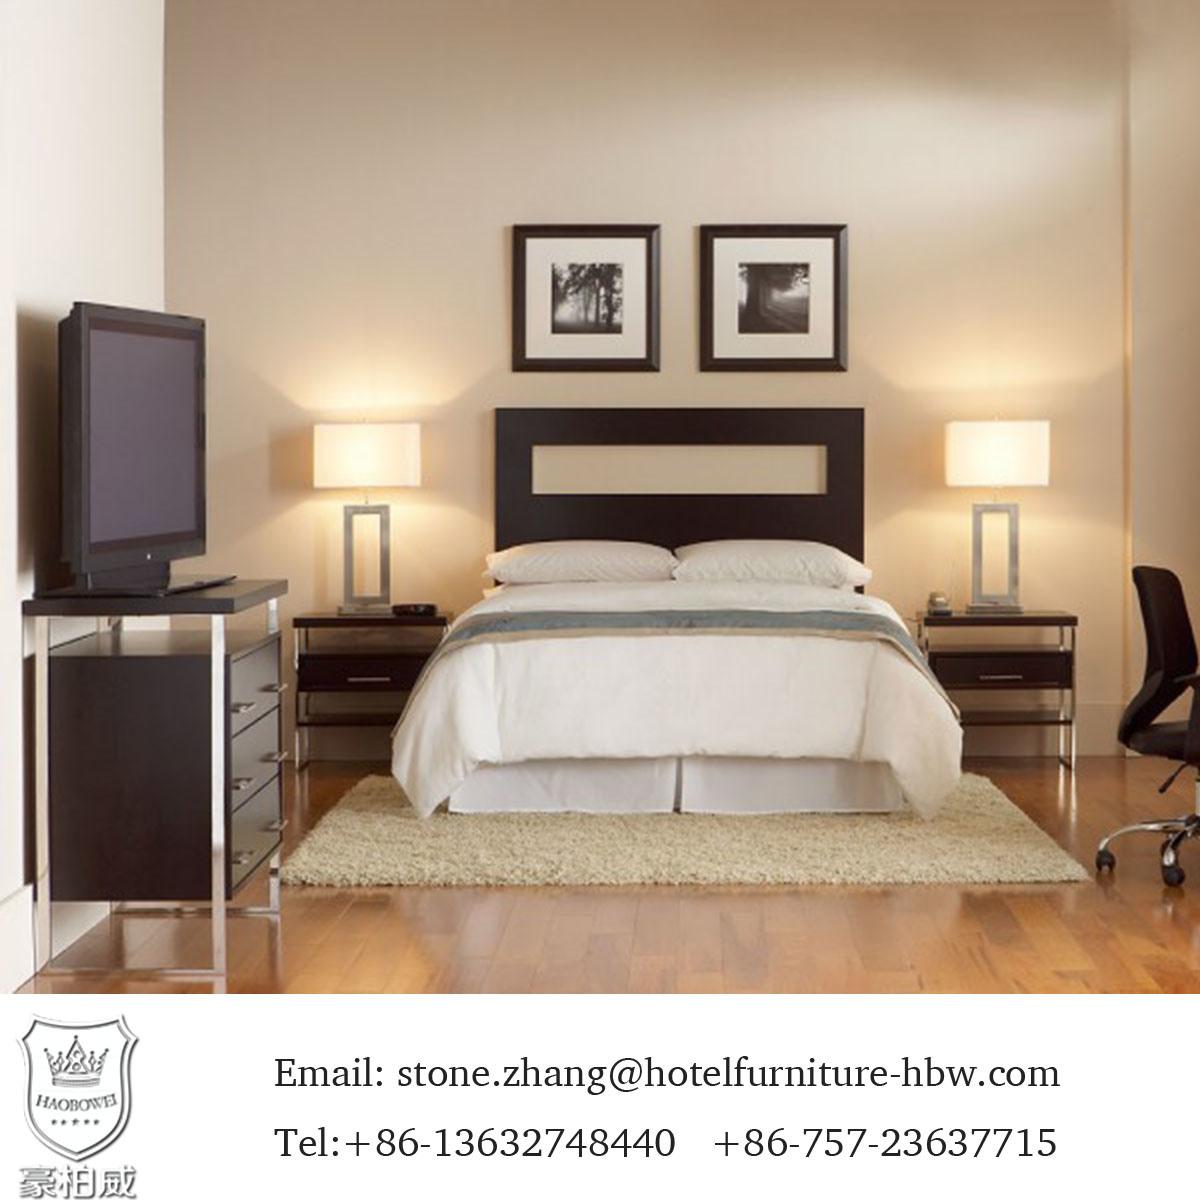 5 Star Modern Design Hotel Furniture for Sale C04